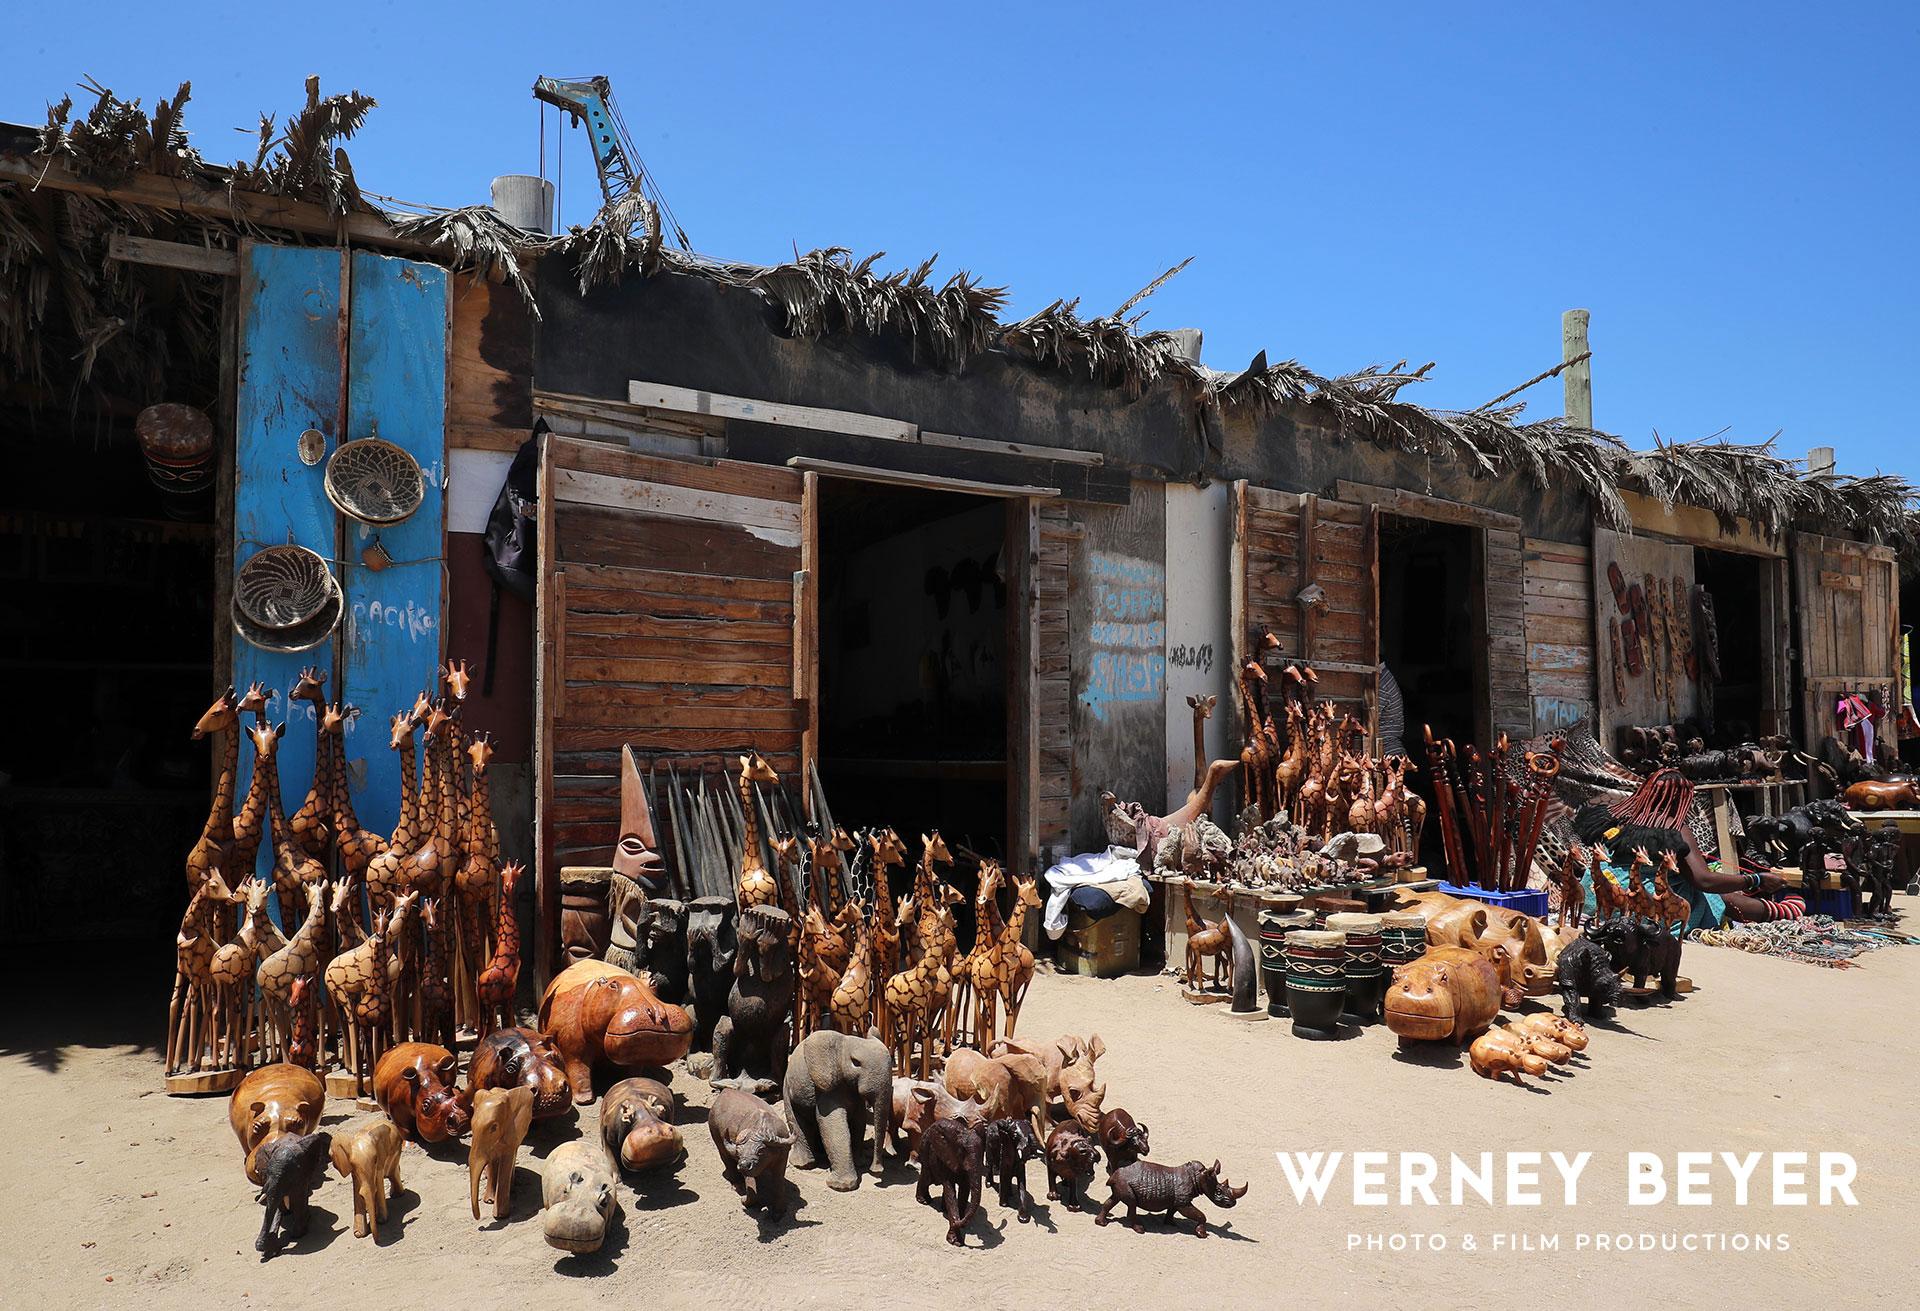 Impression of Namibia, Africa